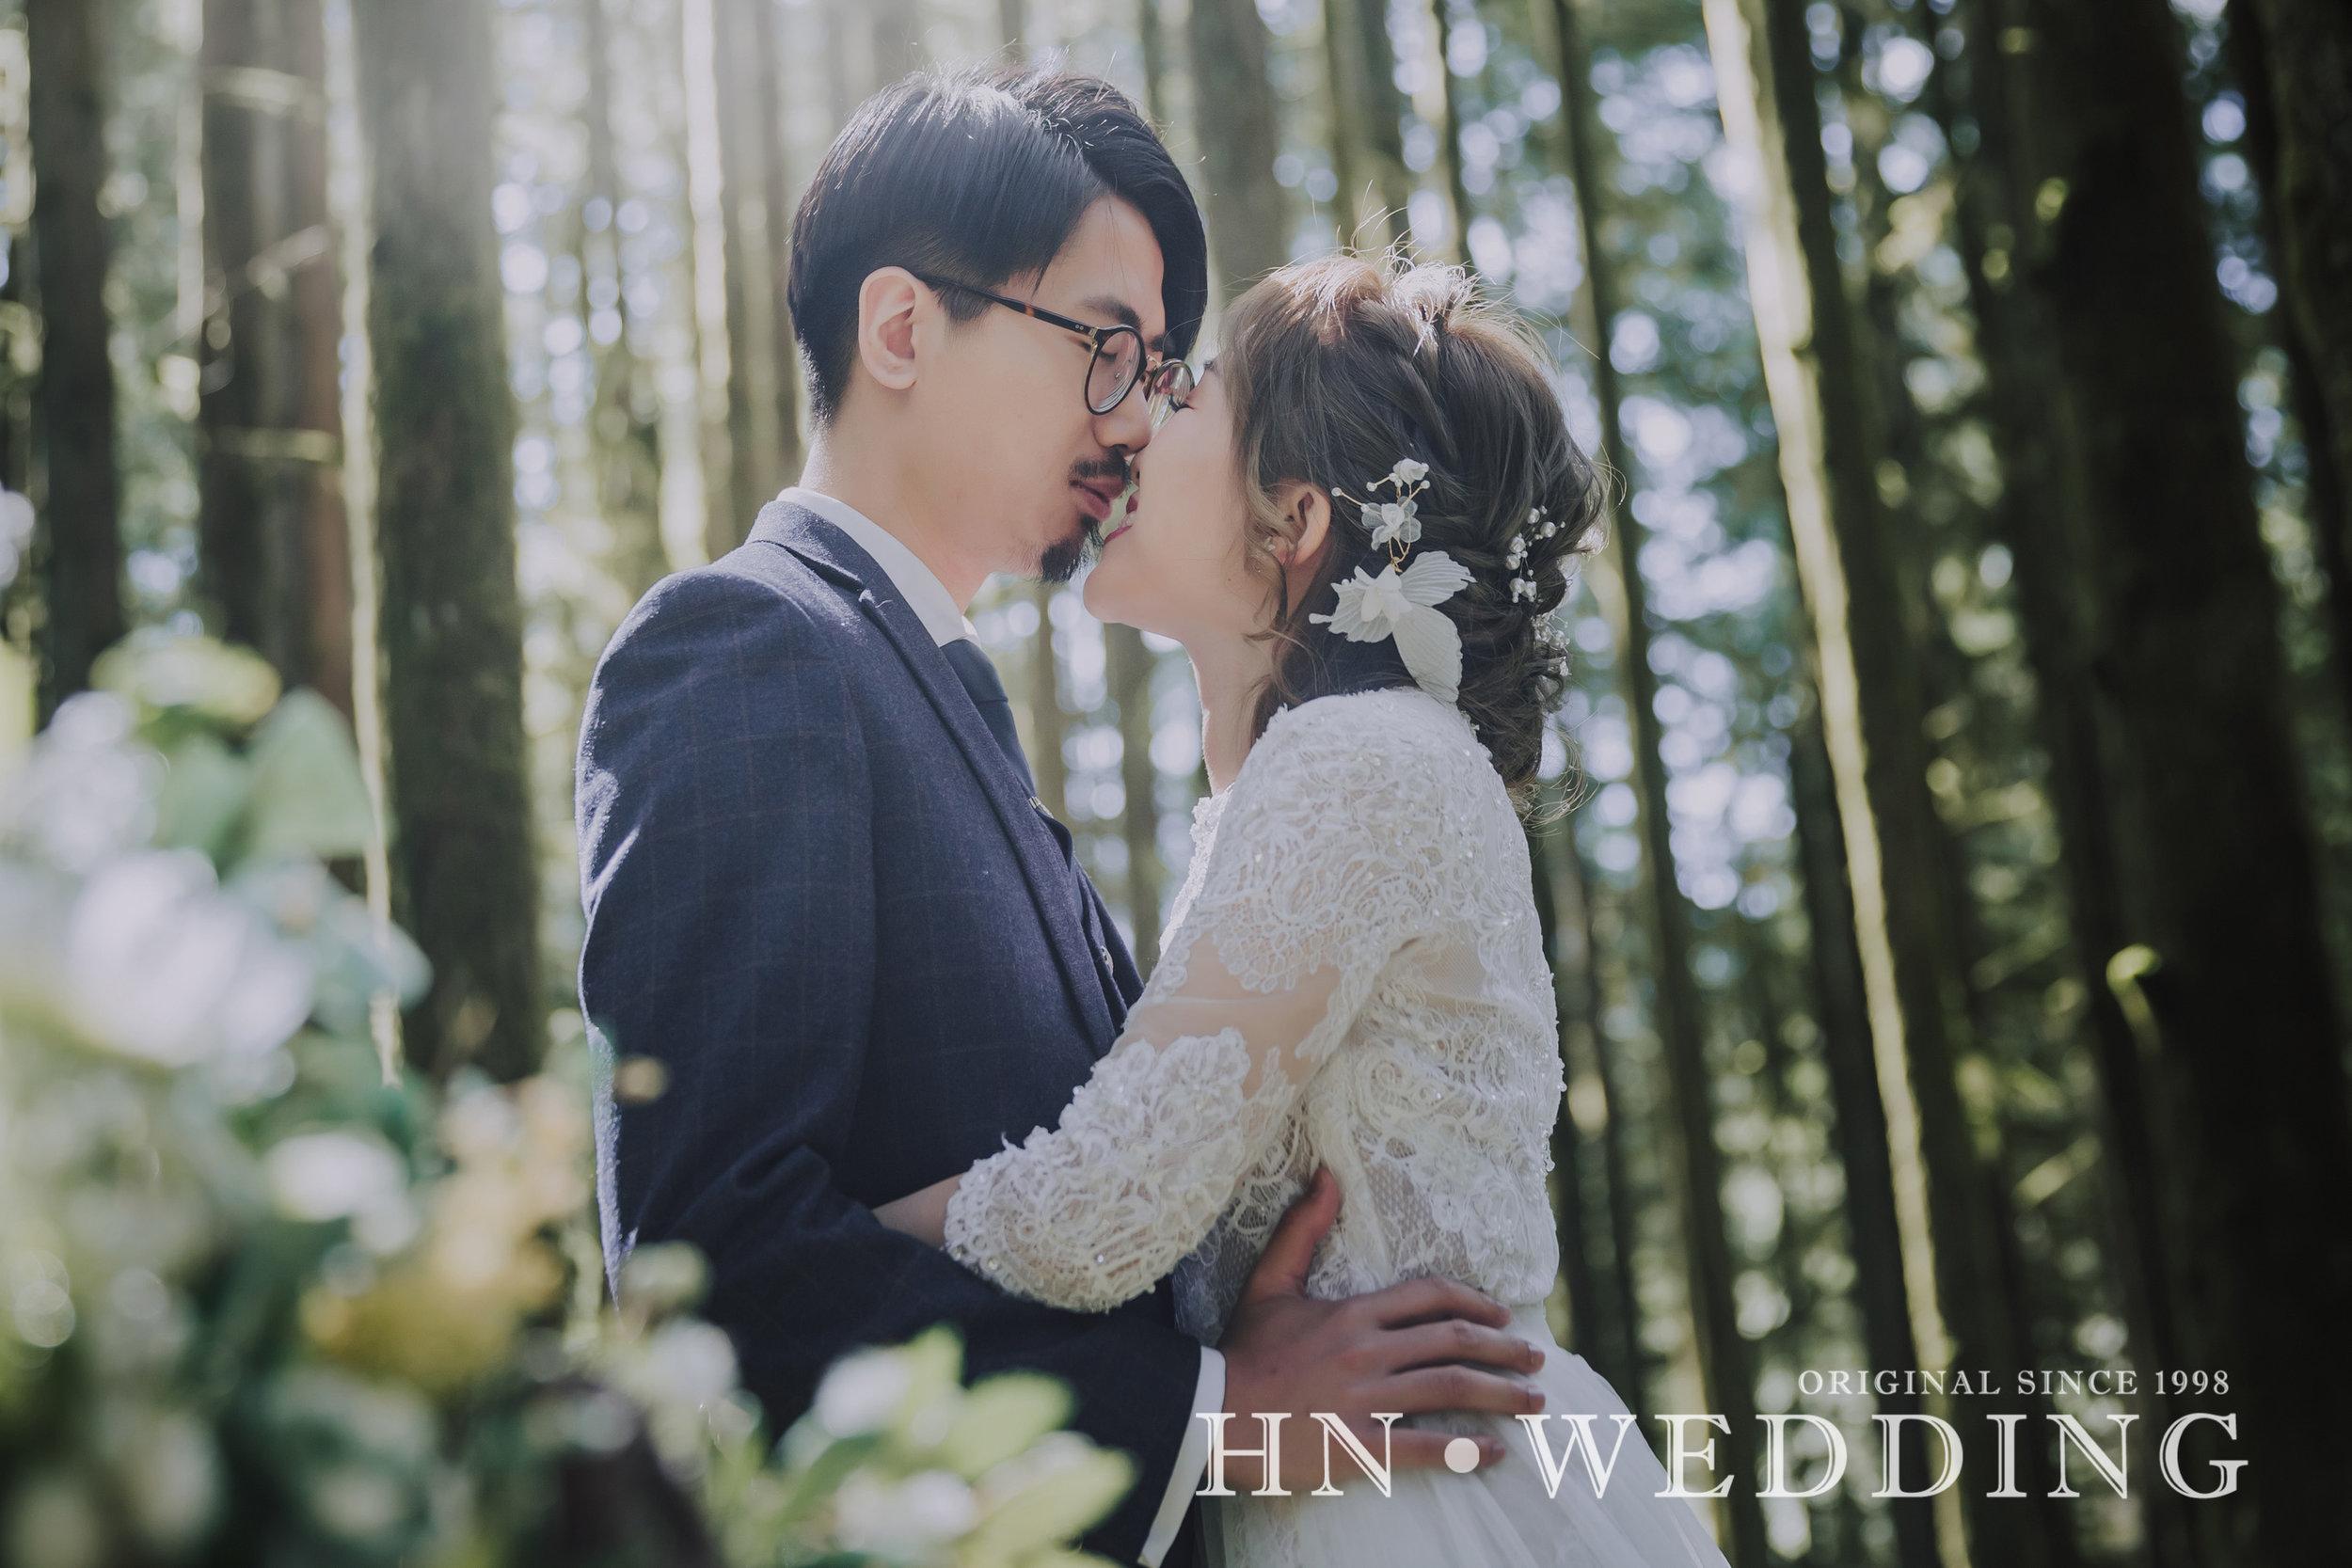 hnweddingweddingdayA&R-6.jpg